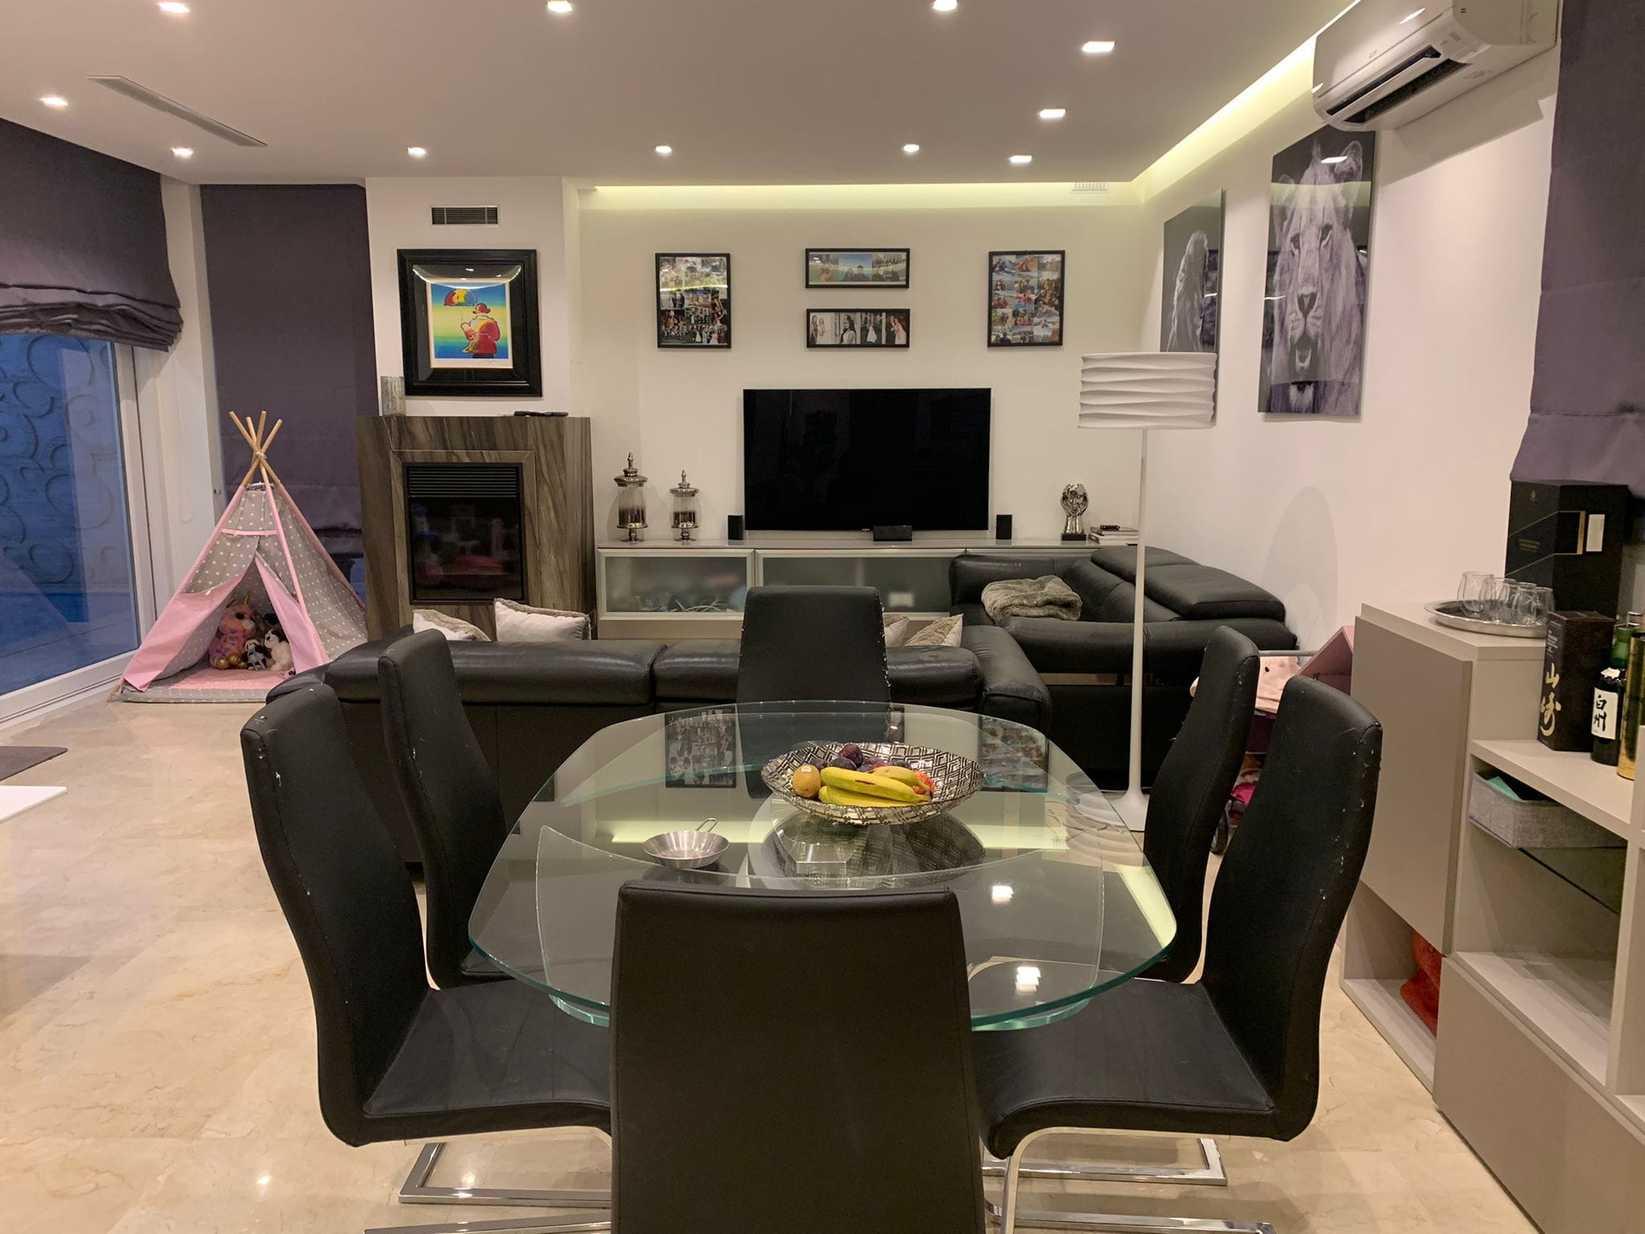 4 bed Villa For Rent in Ibragg, Ibragg - thumb 7